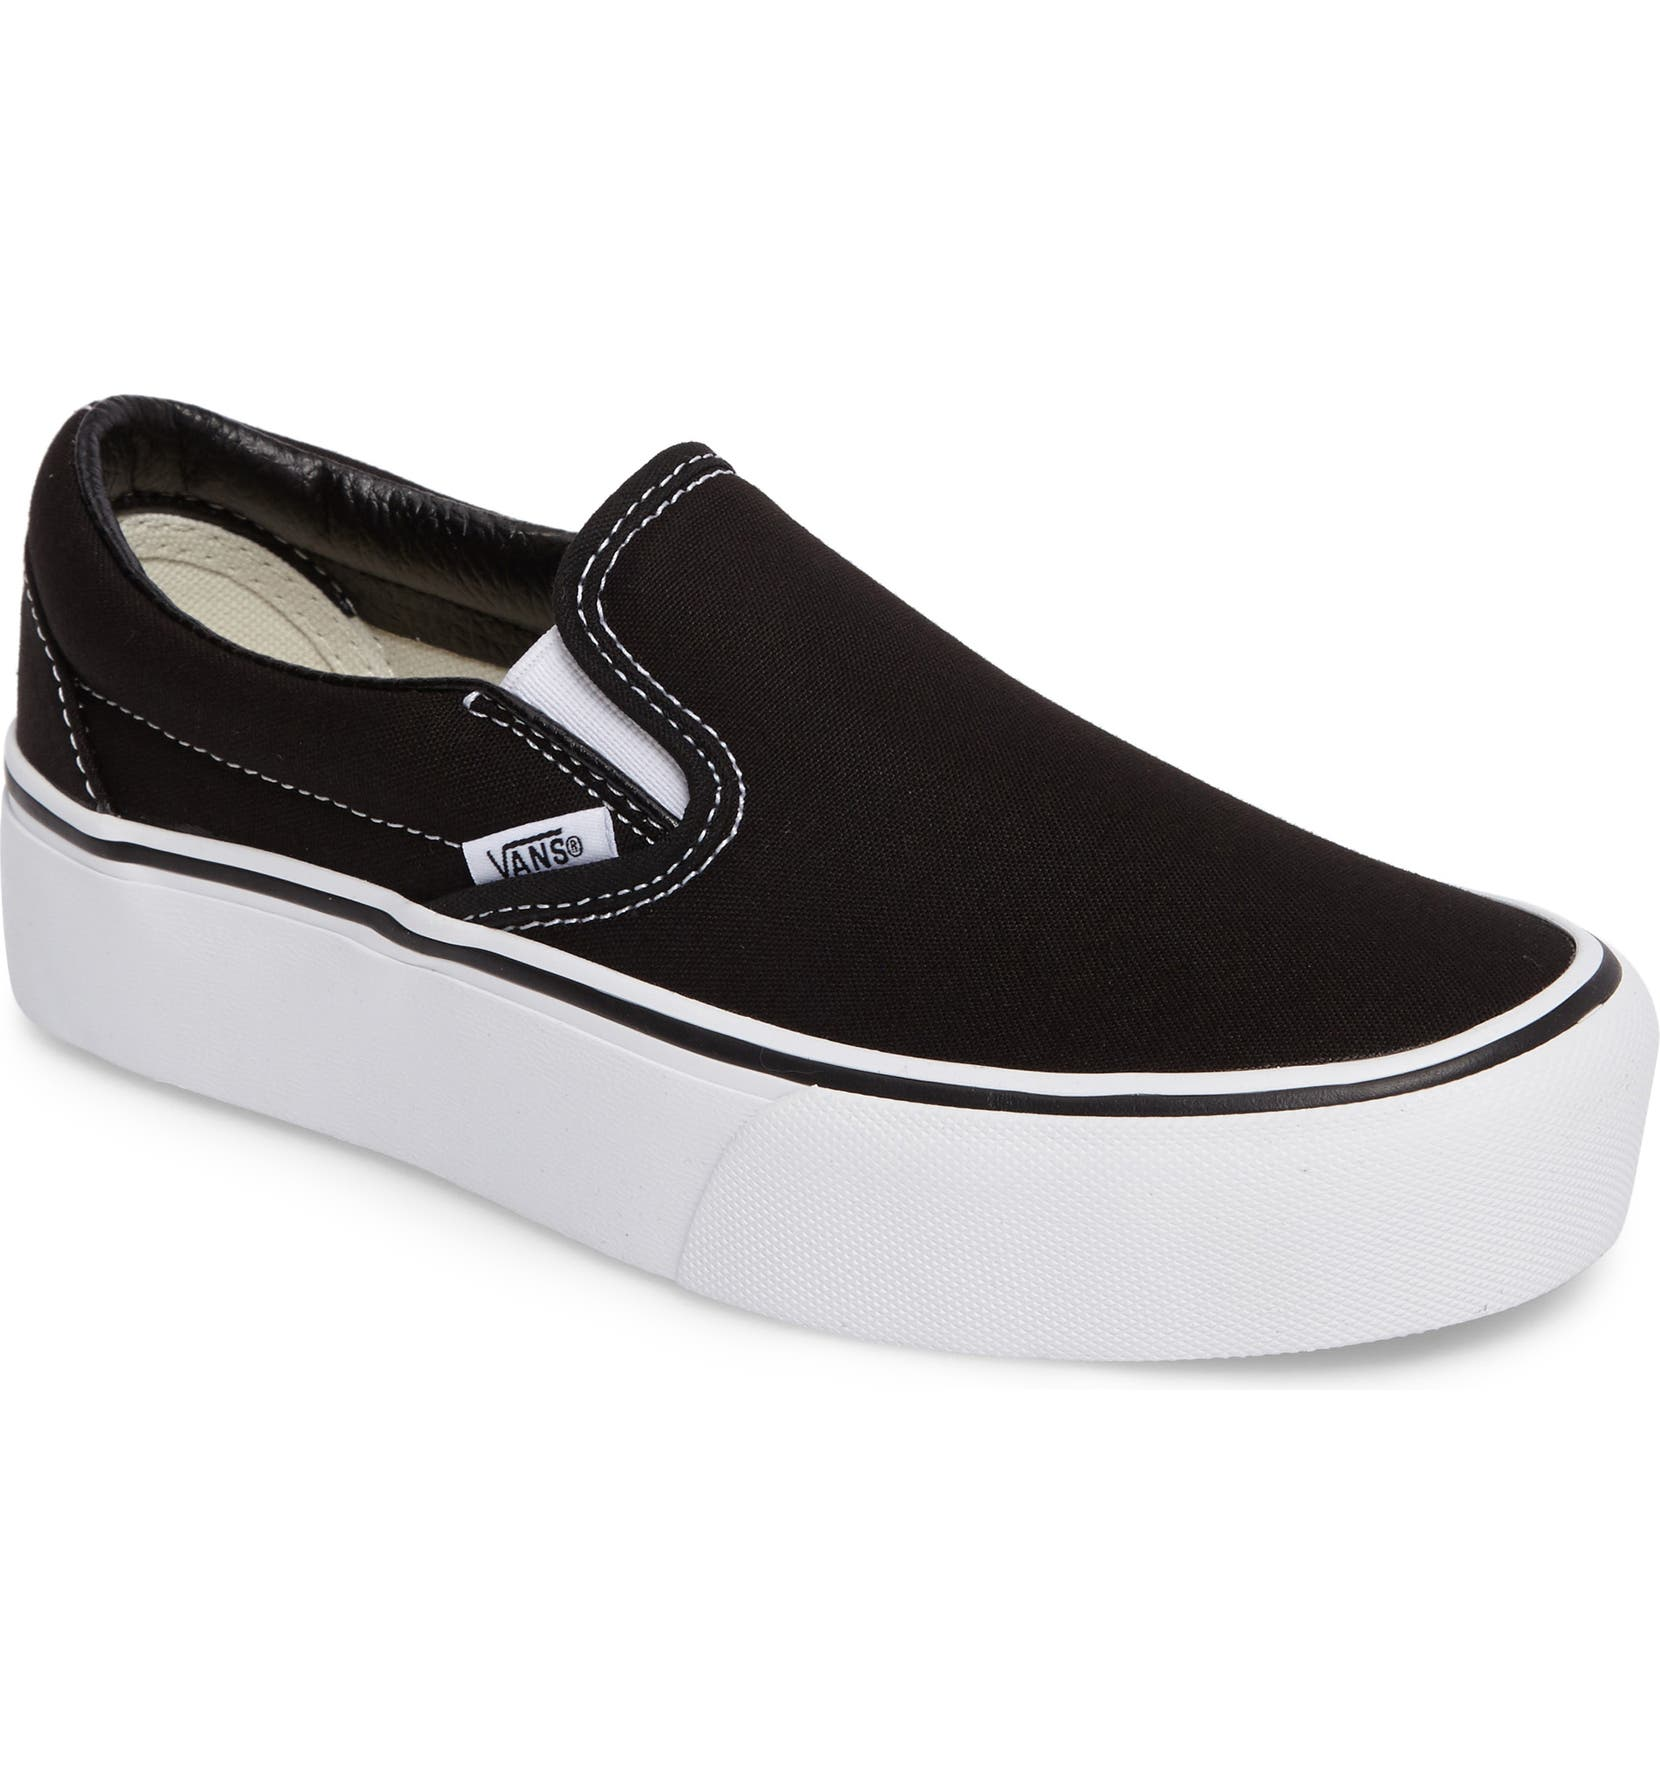 Vans Platform Slip-On Sneaker (Women)  e28b2d1aa